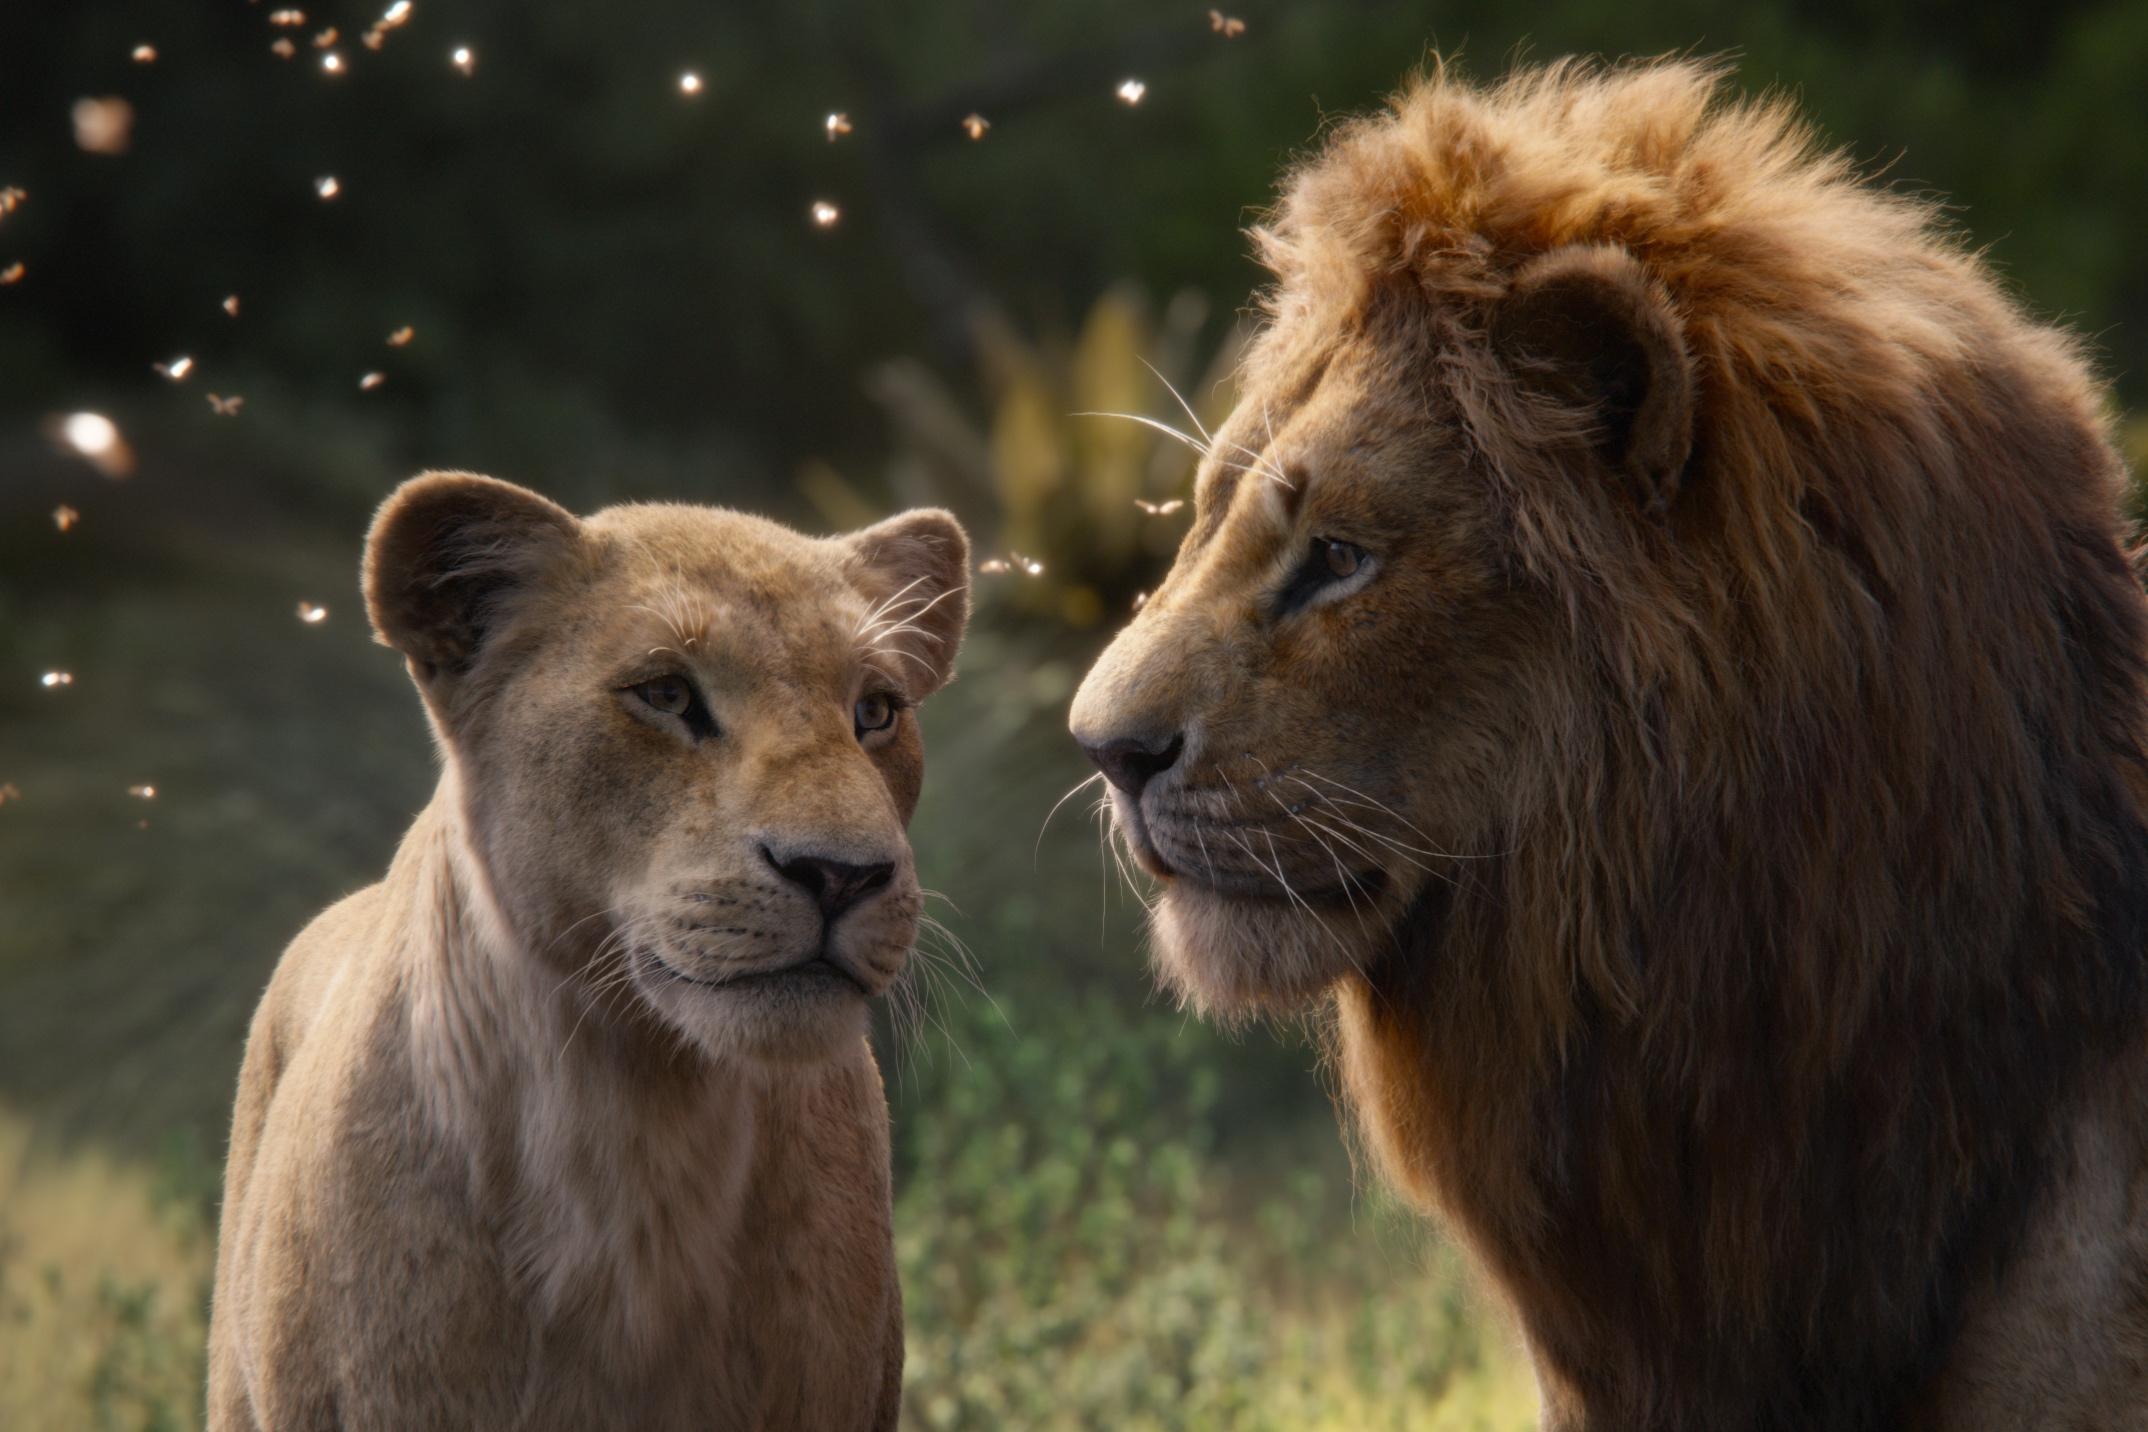 Simba (Glover) and Nala (Knowles-Carter) feeling the love tonight.